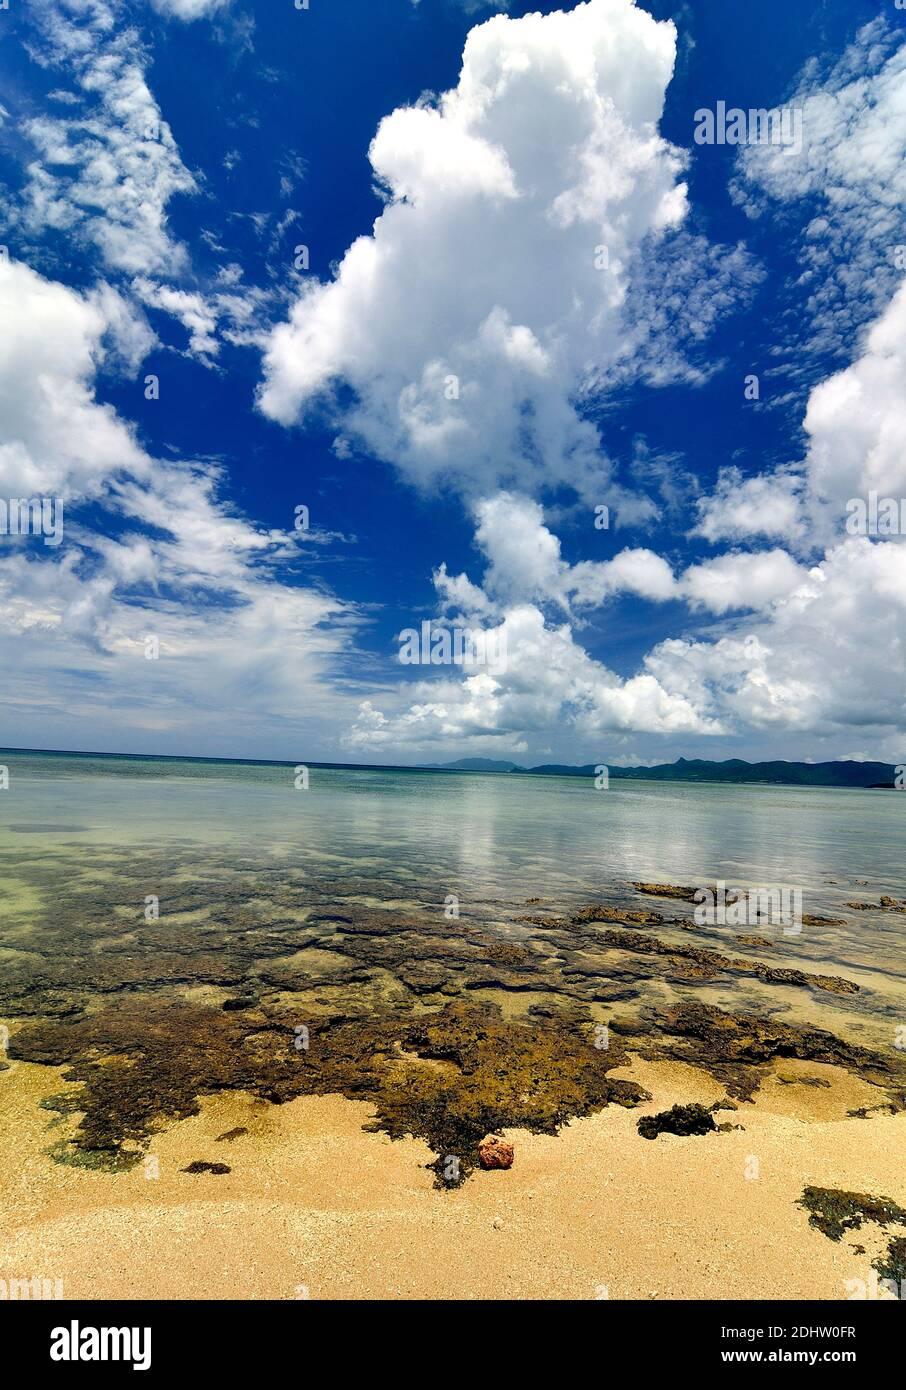 Yonehara Beach, Low Tide,  Empty, Ishigaki, Yahema Islands, Ryukyu Islands, Okinawa, Japan Stock Photo